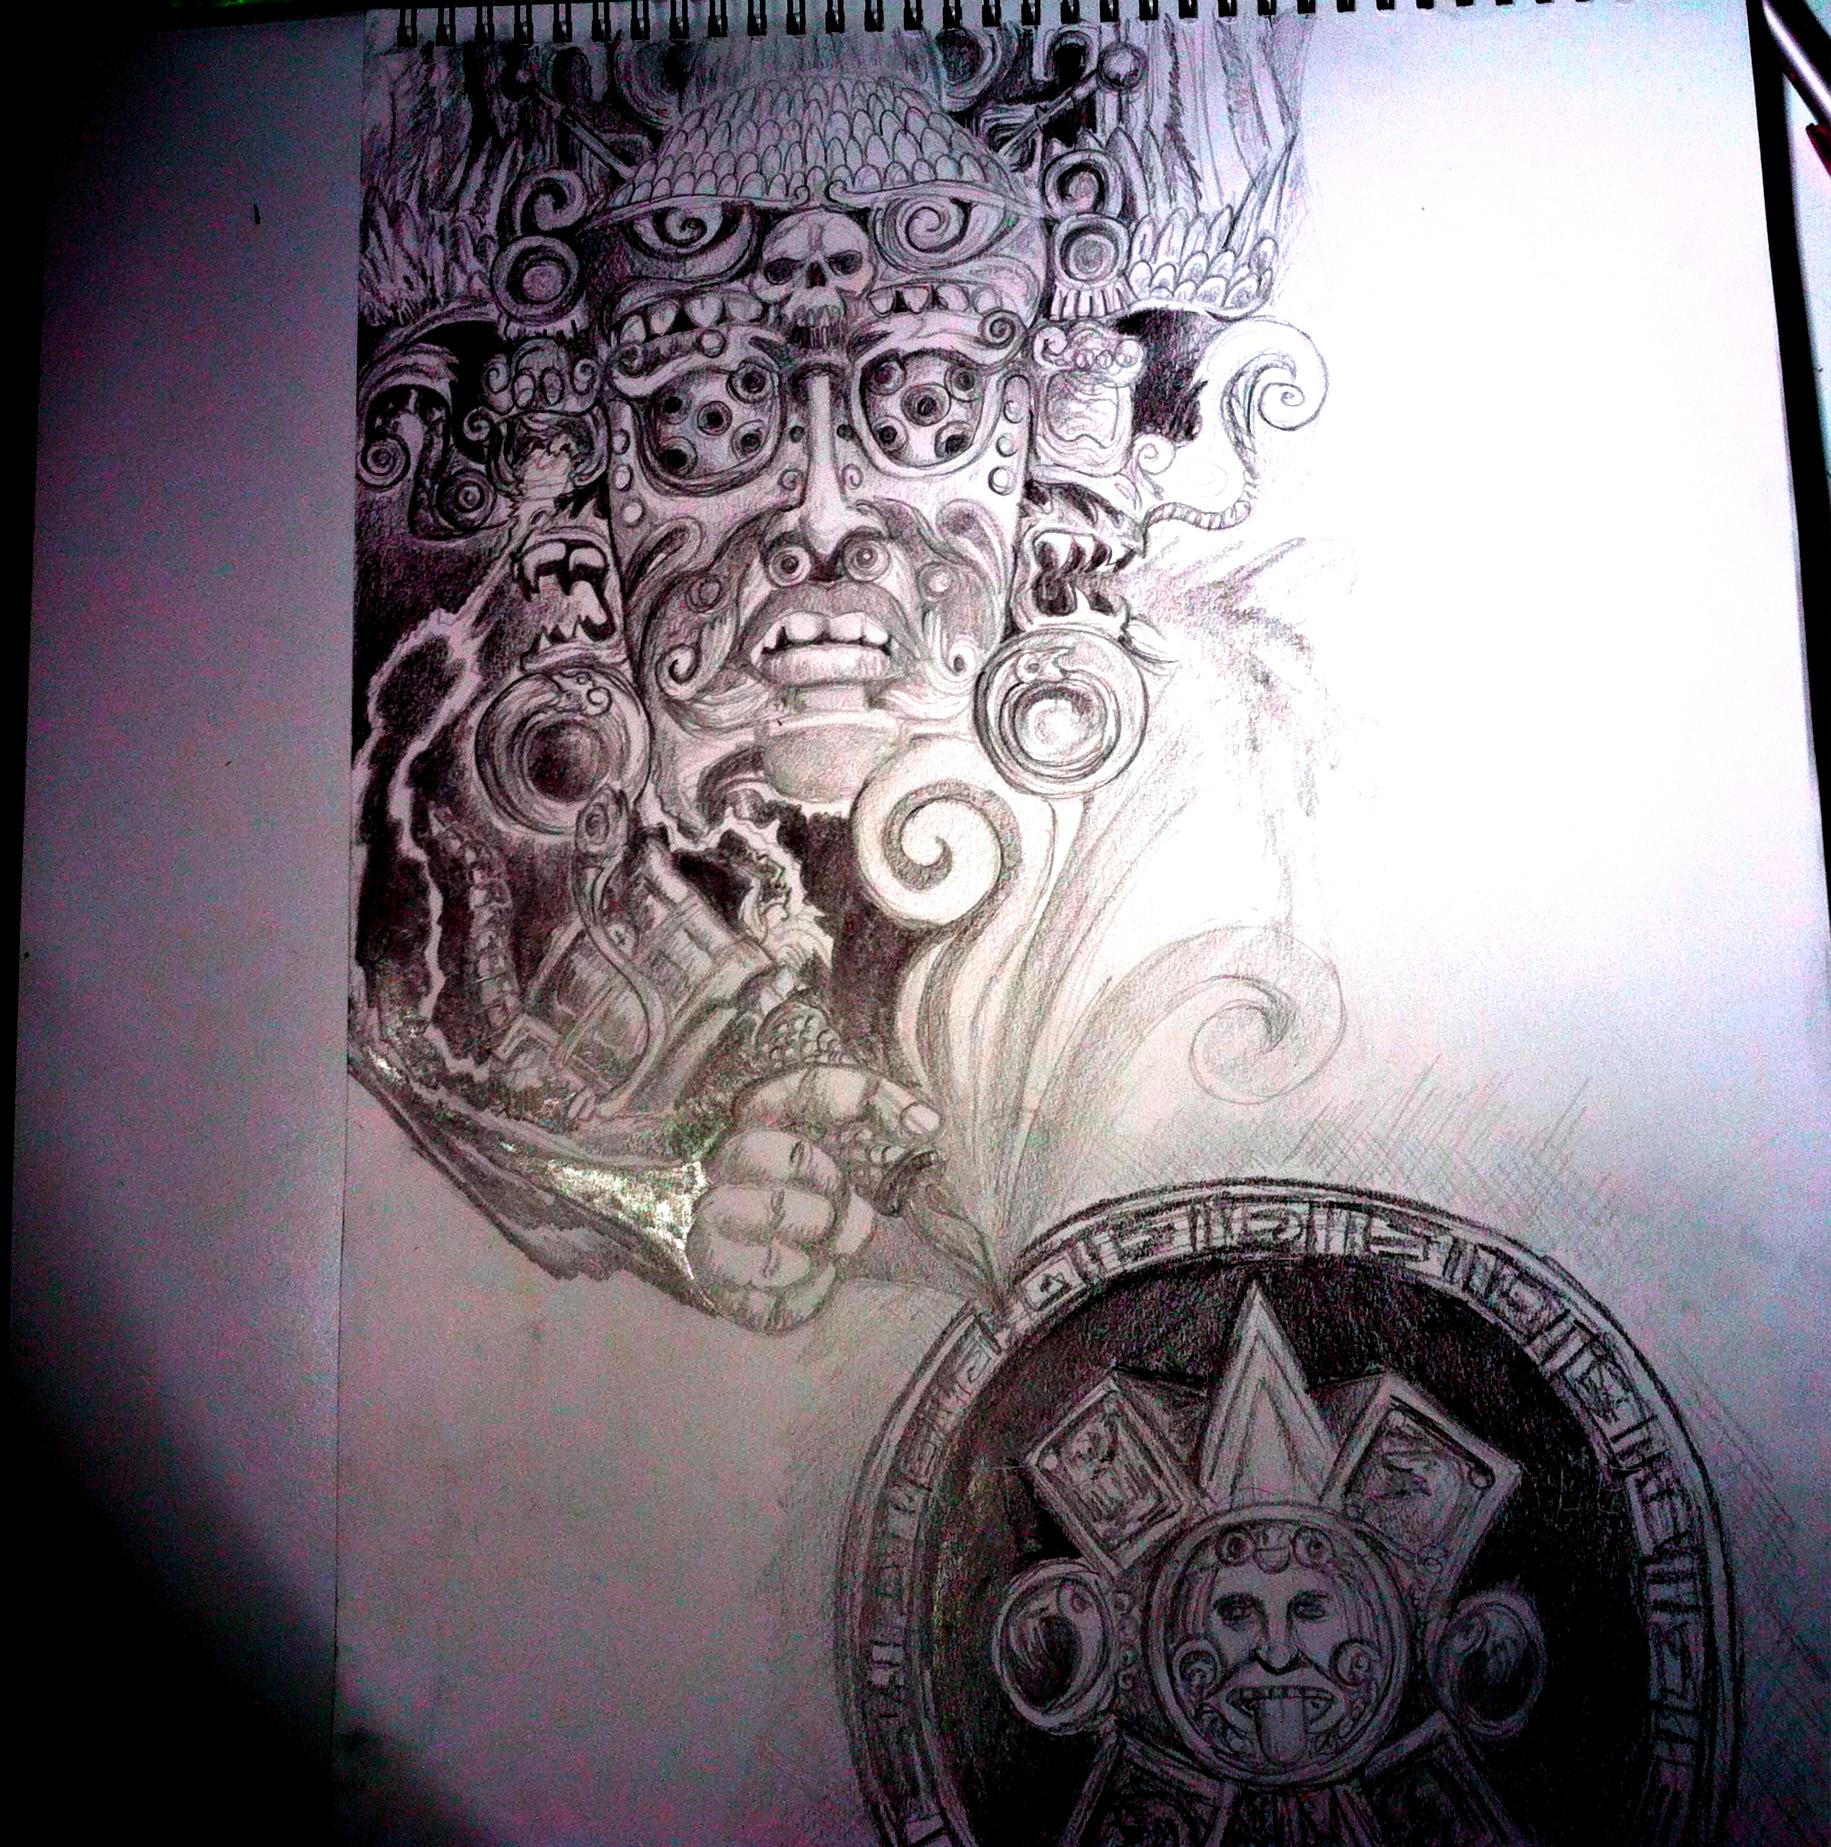 Mayan tattoo design by simoloza on deviantart for Mayan tattoos designs